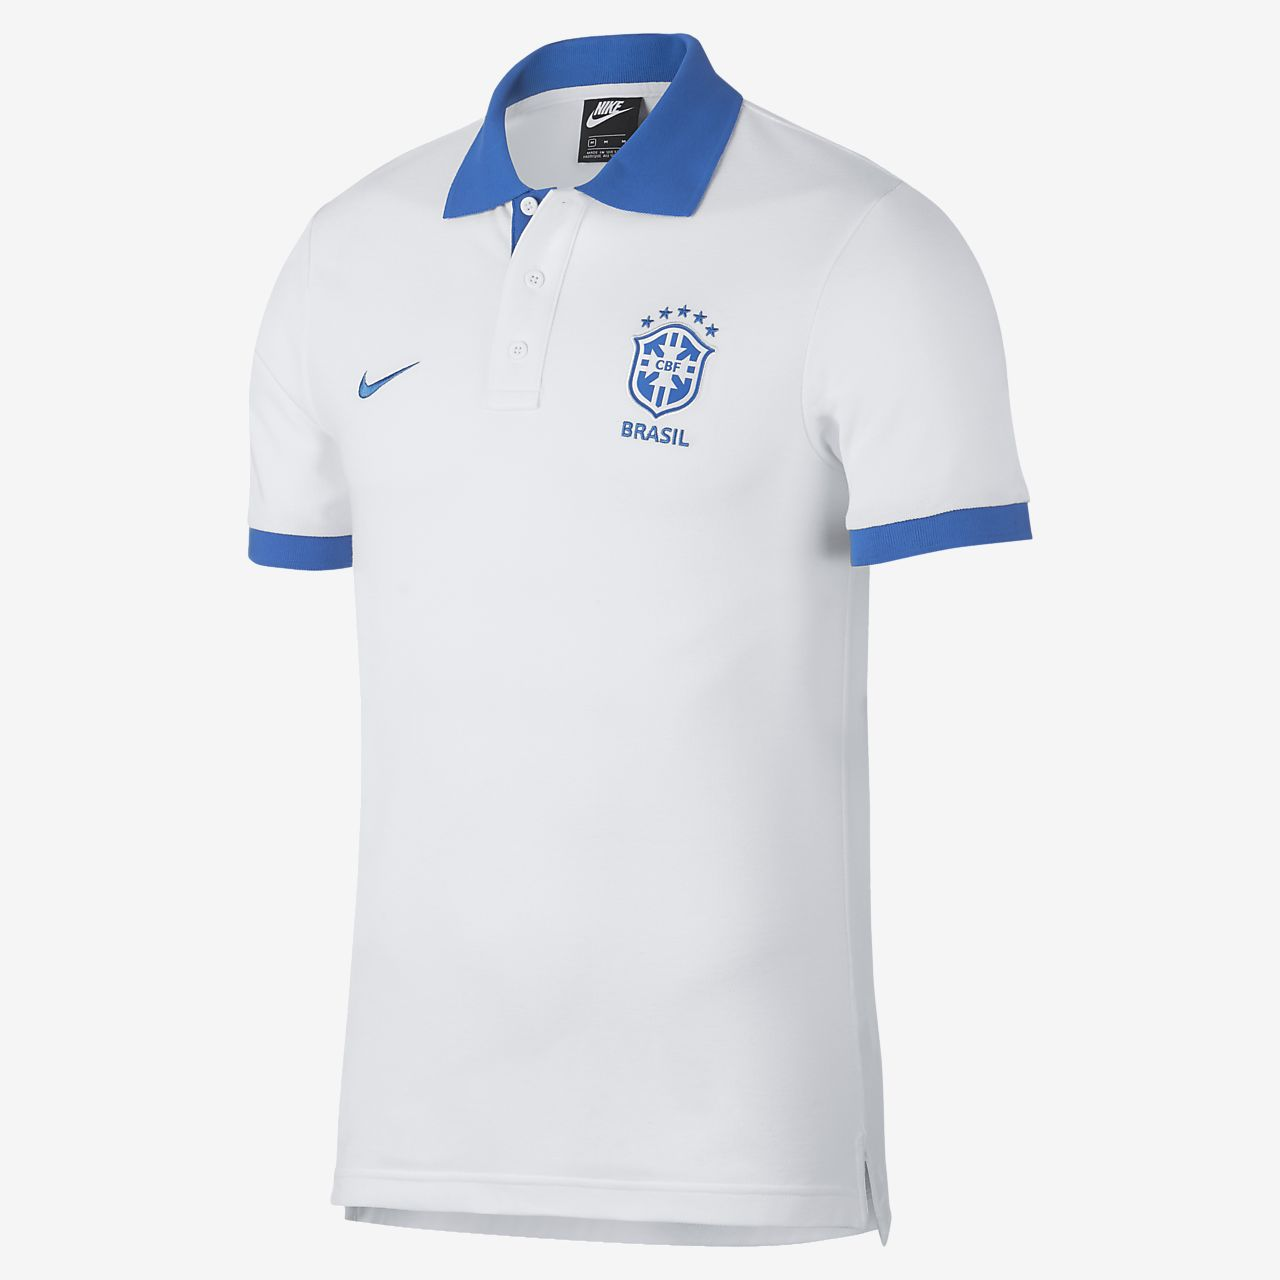 Brasil CBF-fodboldpolo til mænd